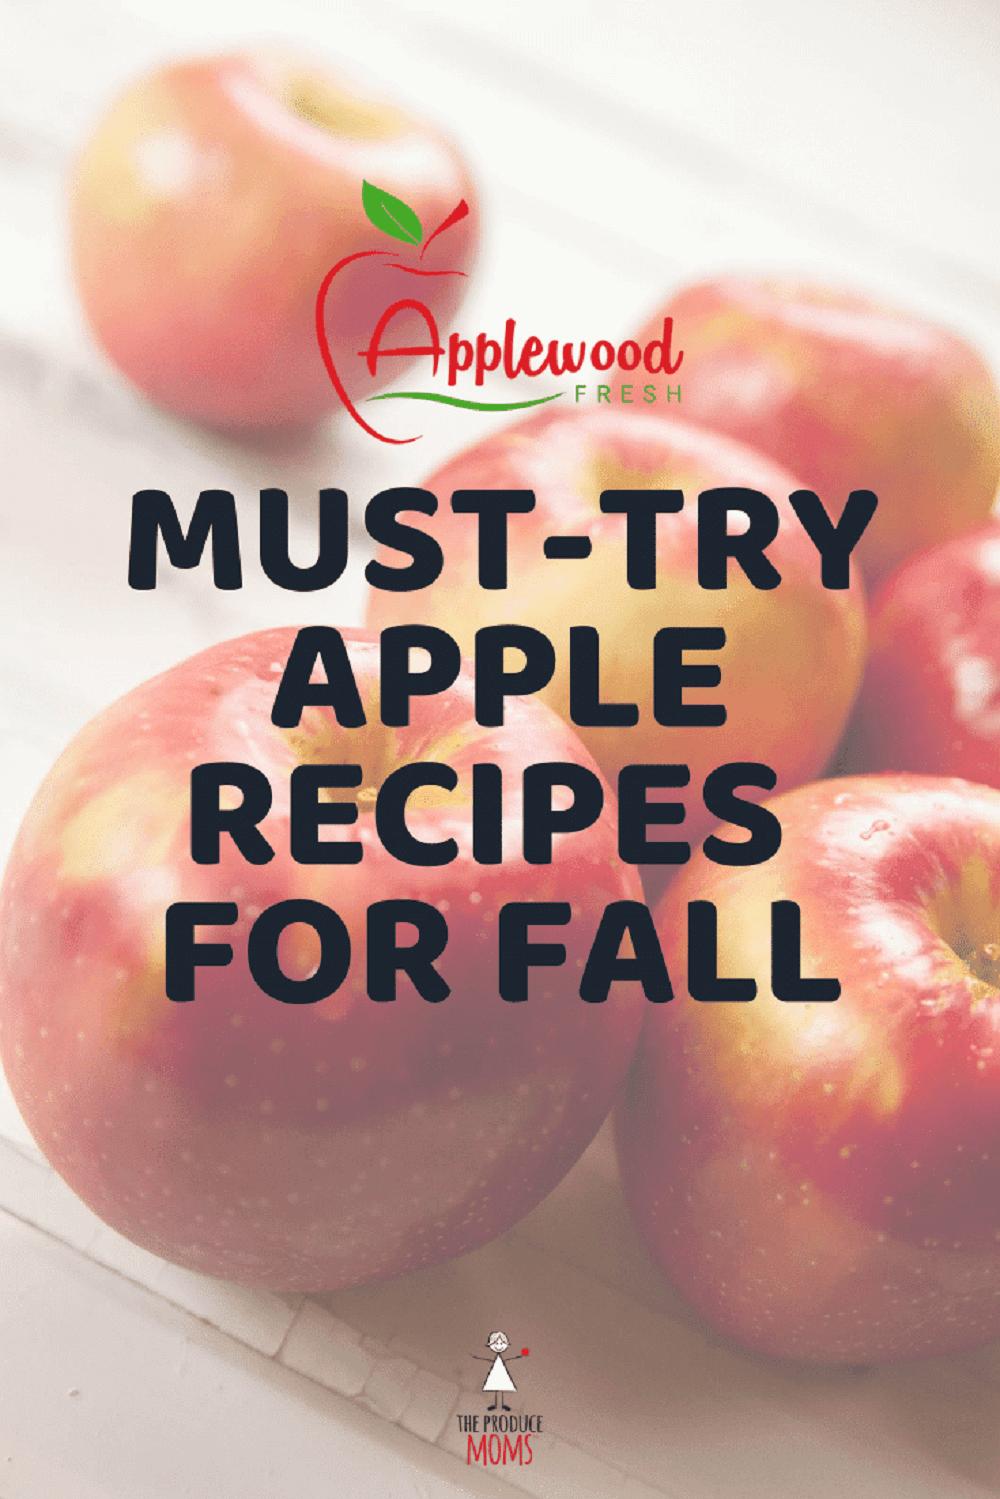 Applewood Fresh Apples Pinterest Card